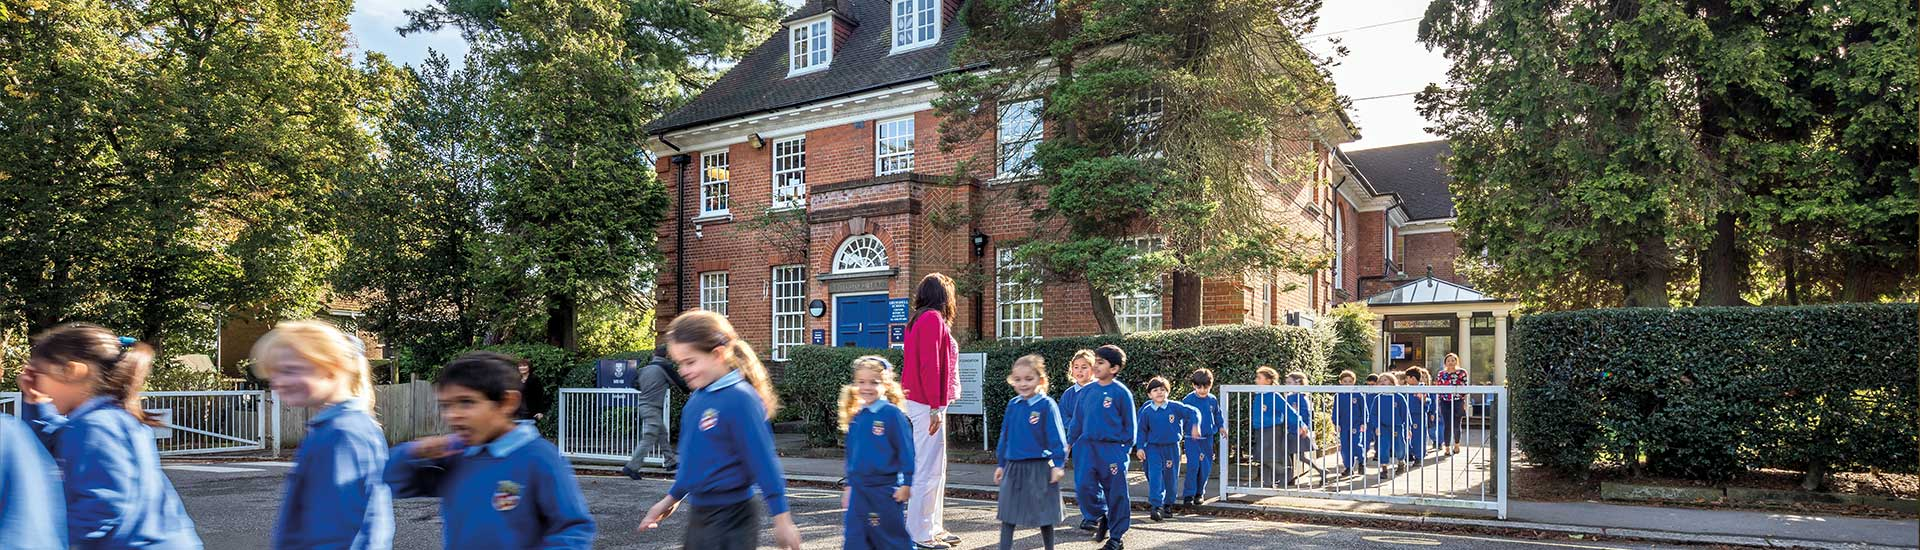 Grimsdell - School environment